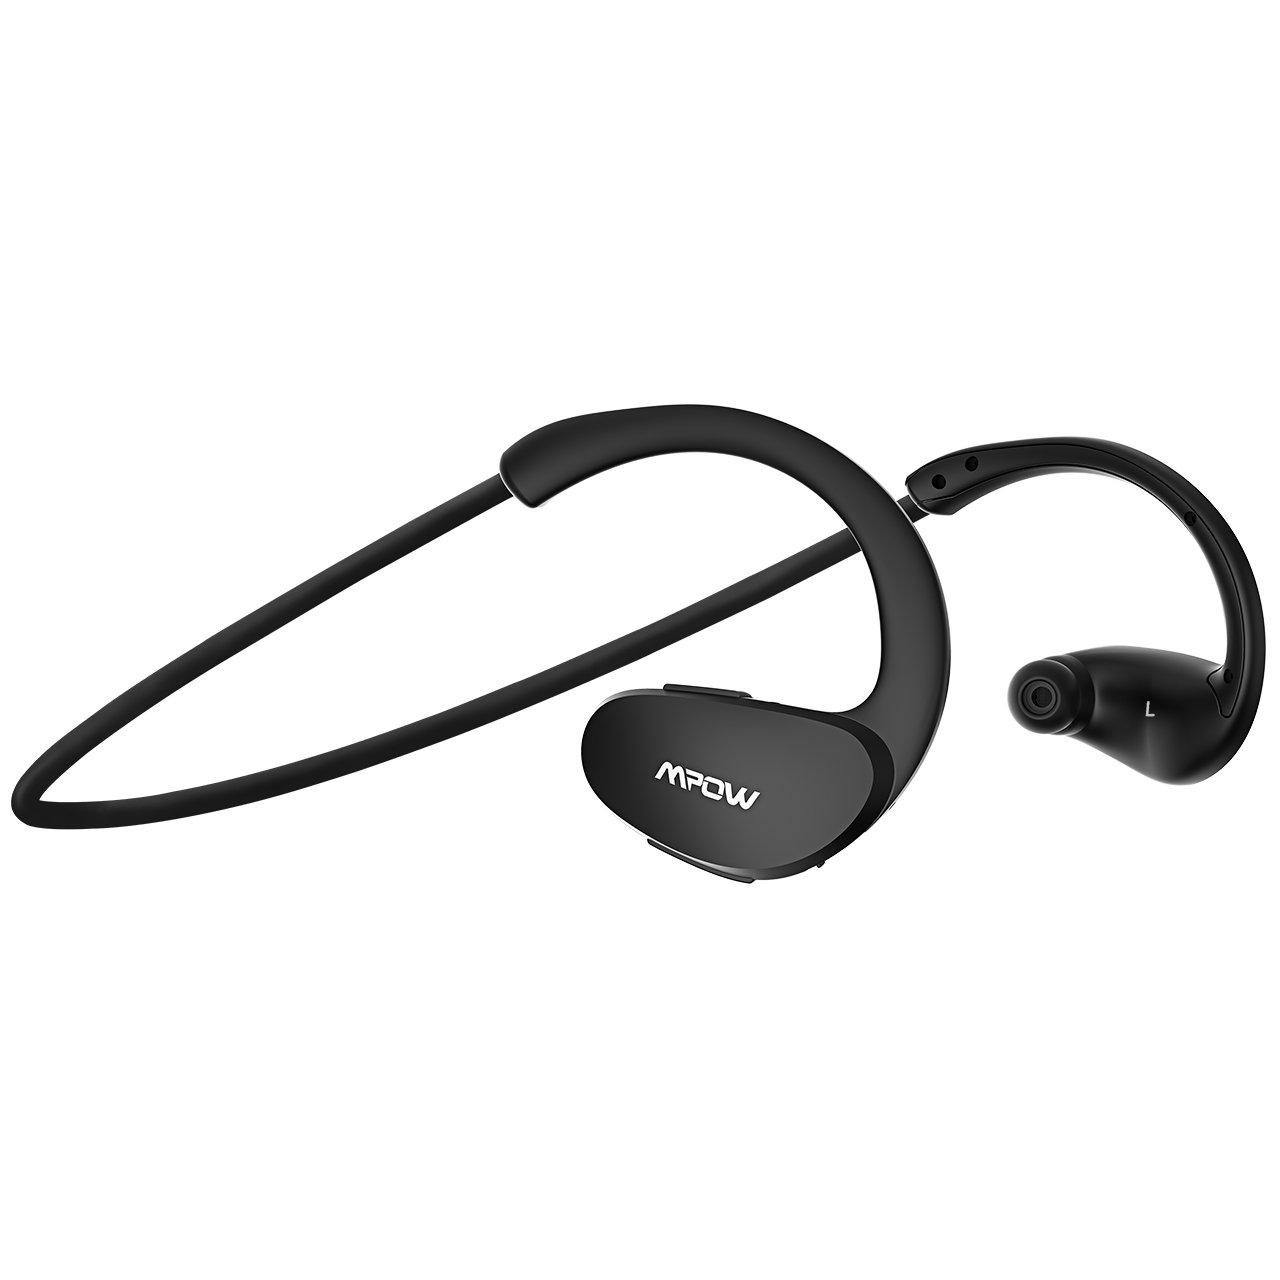 Mpow Cheetah Bluetooth Headphones, Sport Wireless Earbuds w/Aptx Sound, IPX5 Waterproof&8 Hrs Playtime, V4.1 Wireless Sport Headphones, Behind-Ear Running Headset w/CVC6.0 Noise Cancelling Mic,Black by Mpow